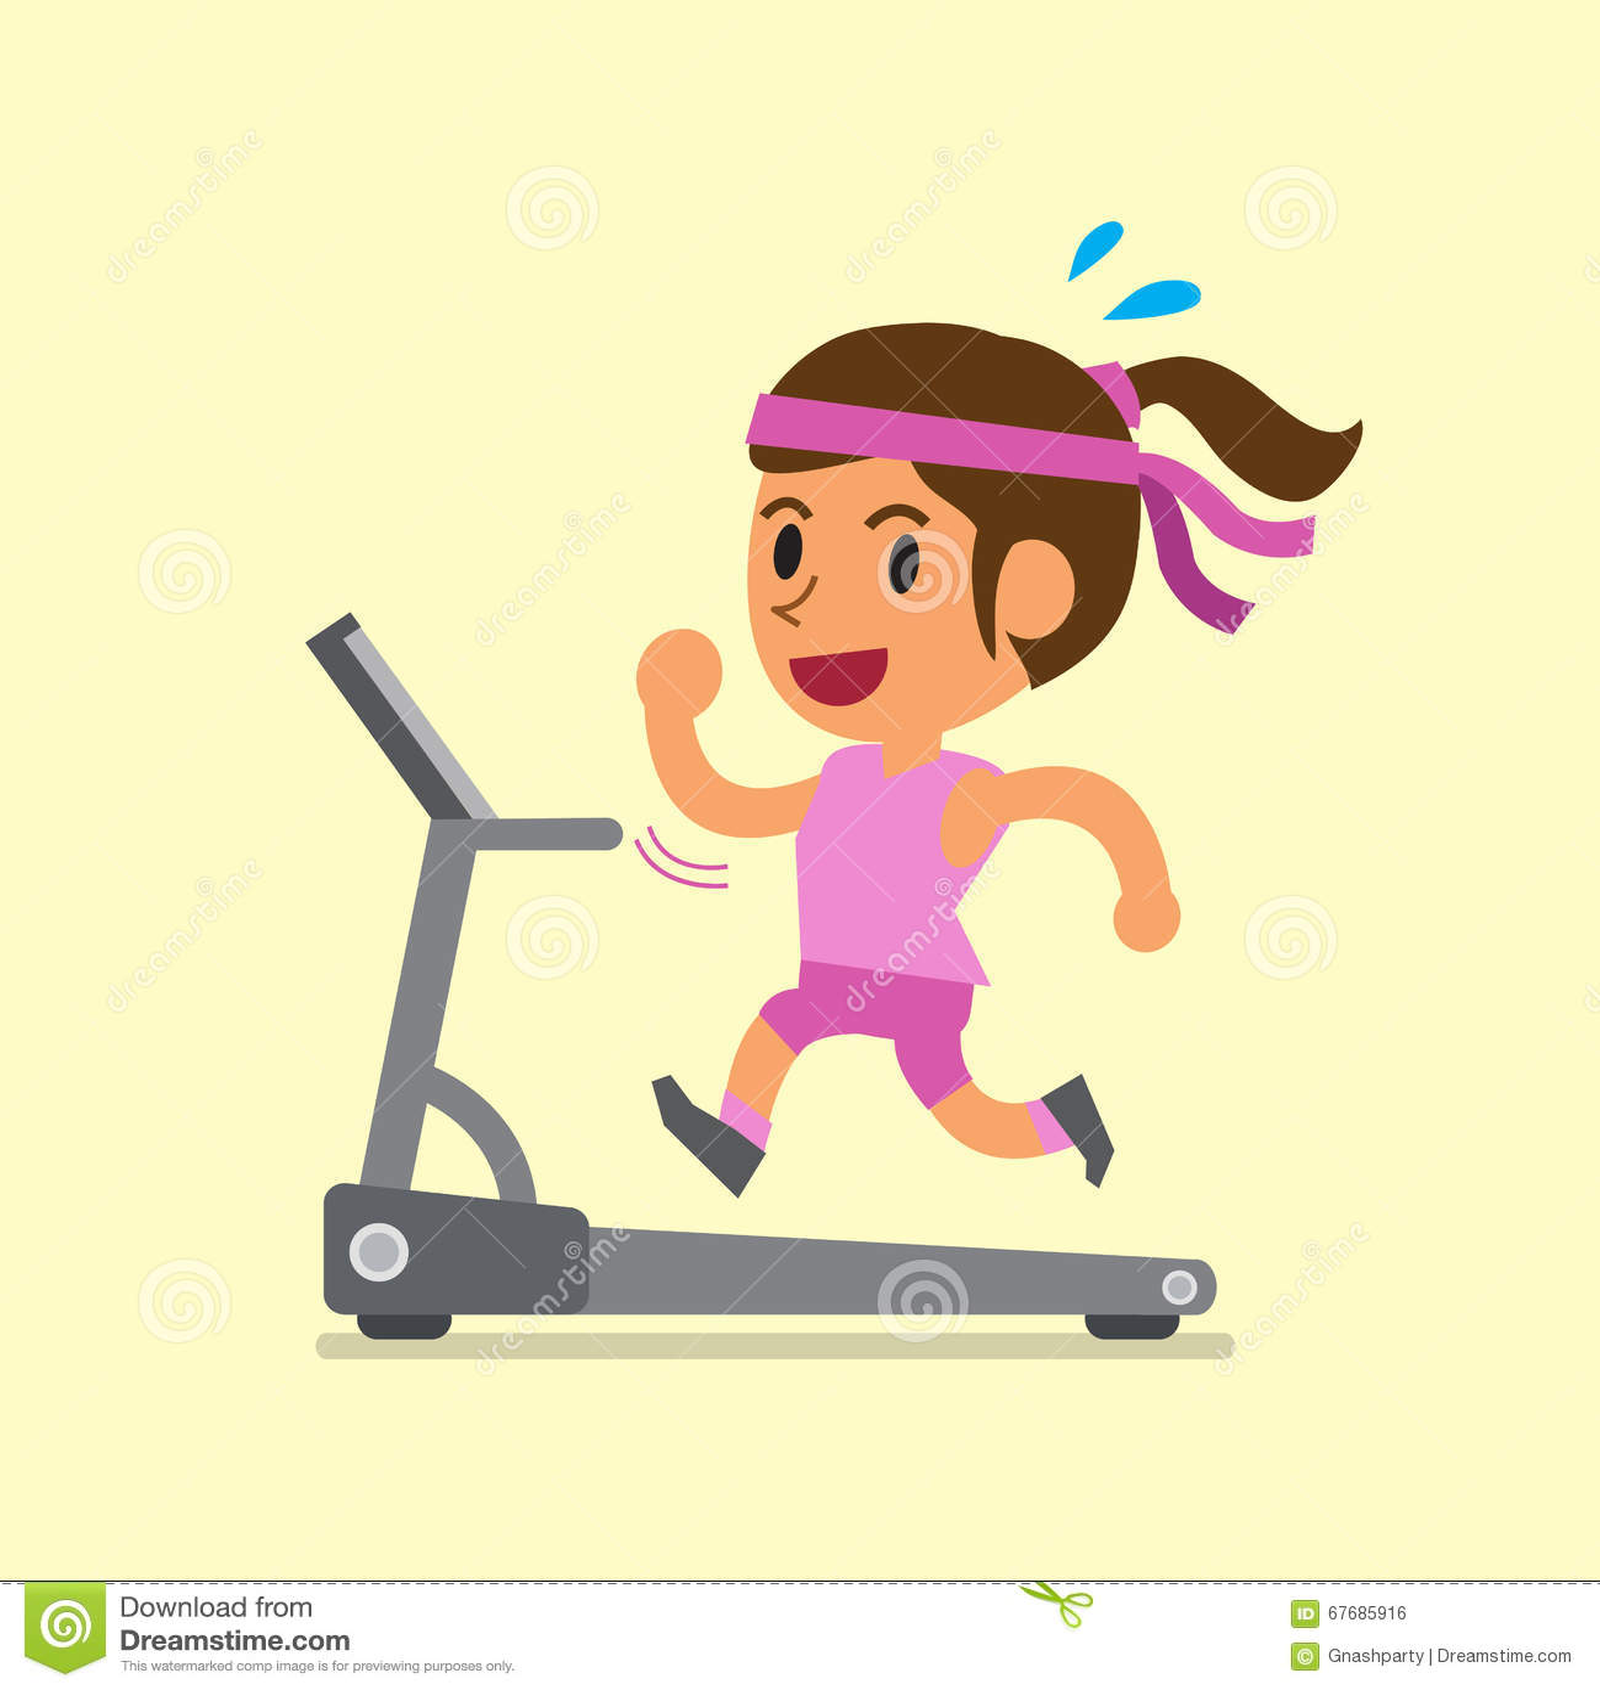 Treadmill dating site